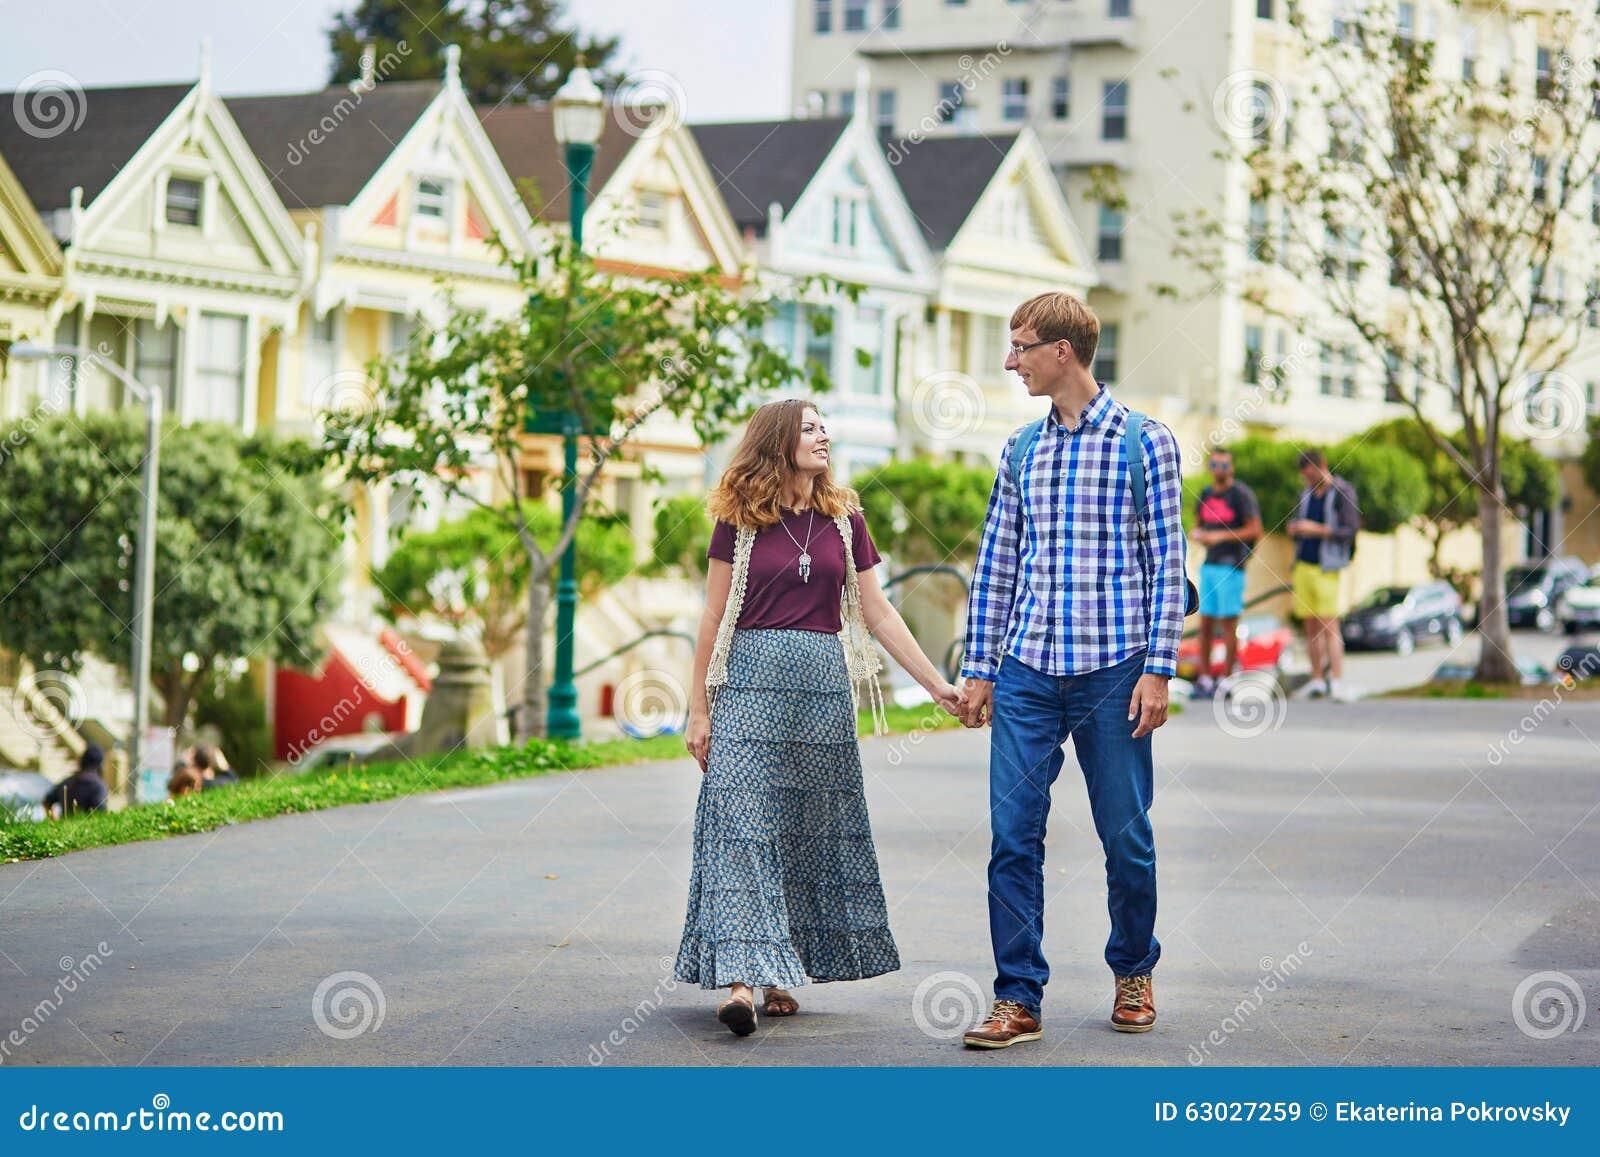 California Francisco Dating San In